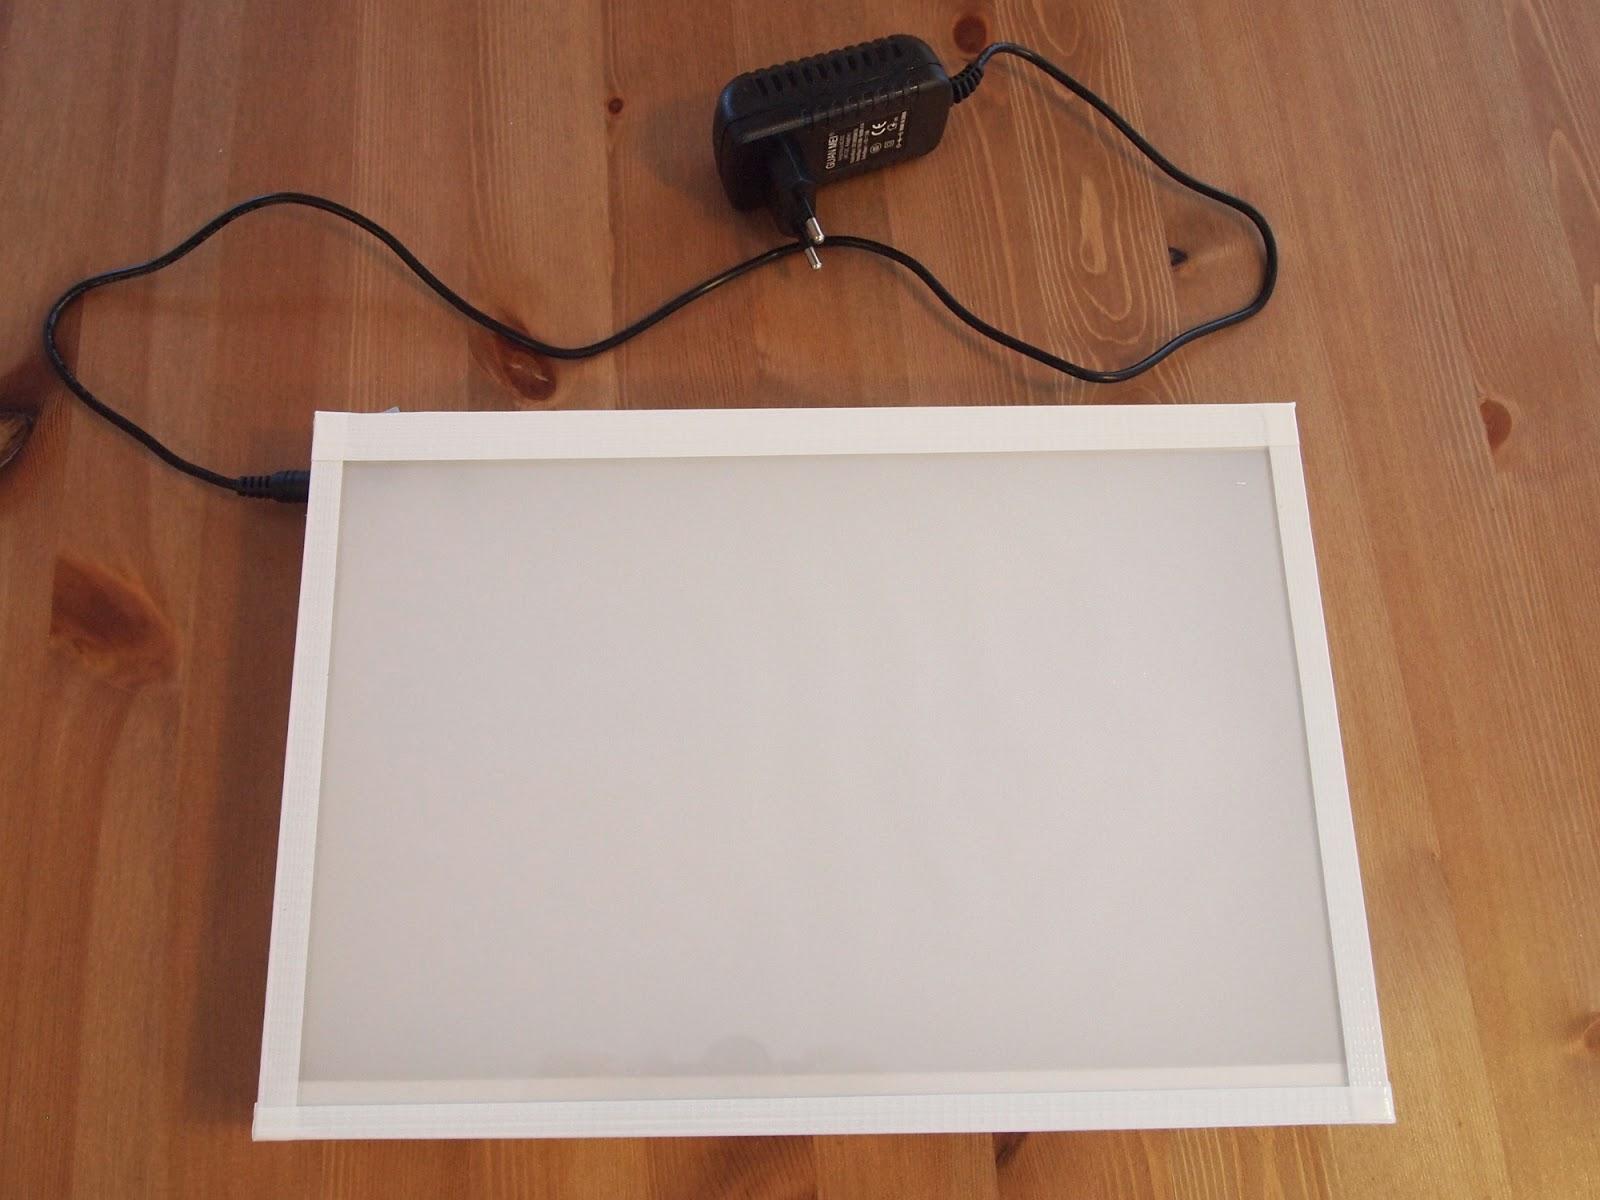 la fabrique d 39 itsmil fabrication d 39 une table lumineuse a4. Black Bedroom Furniture Sets. Home Design Ideas